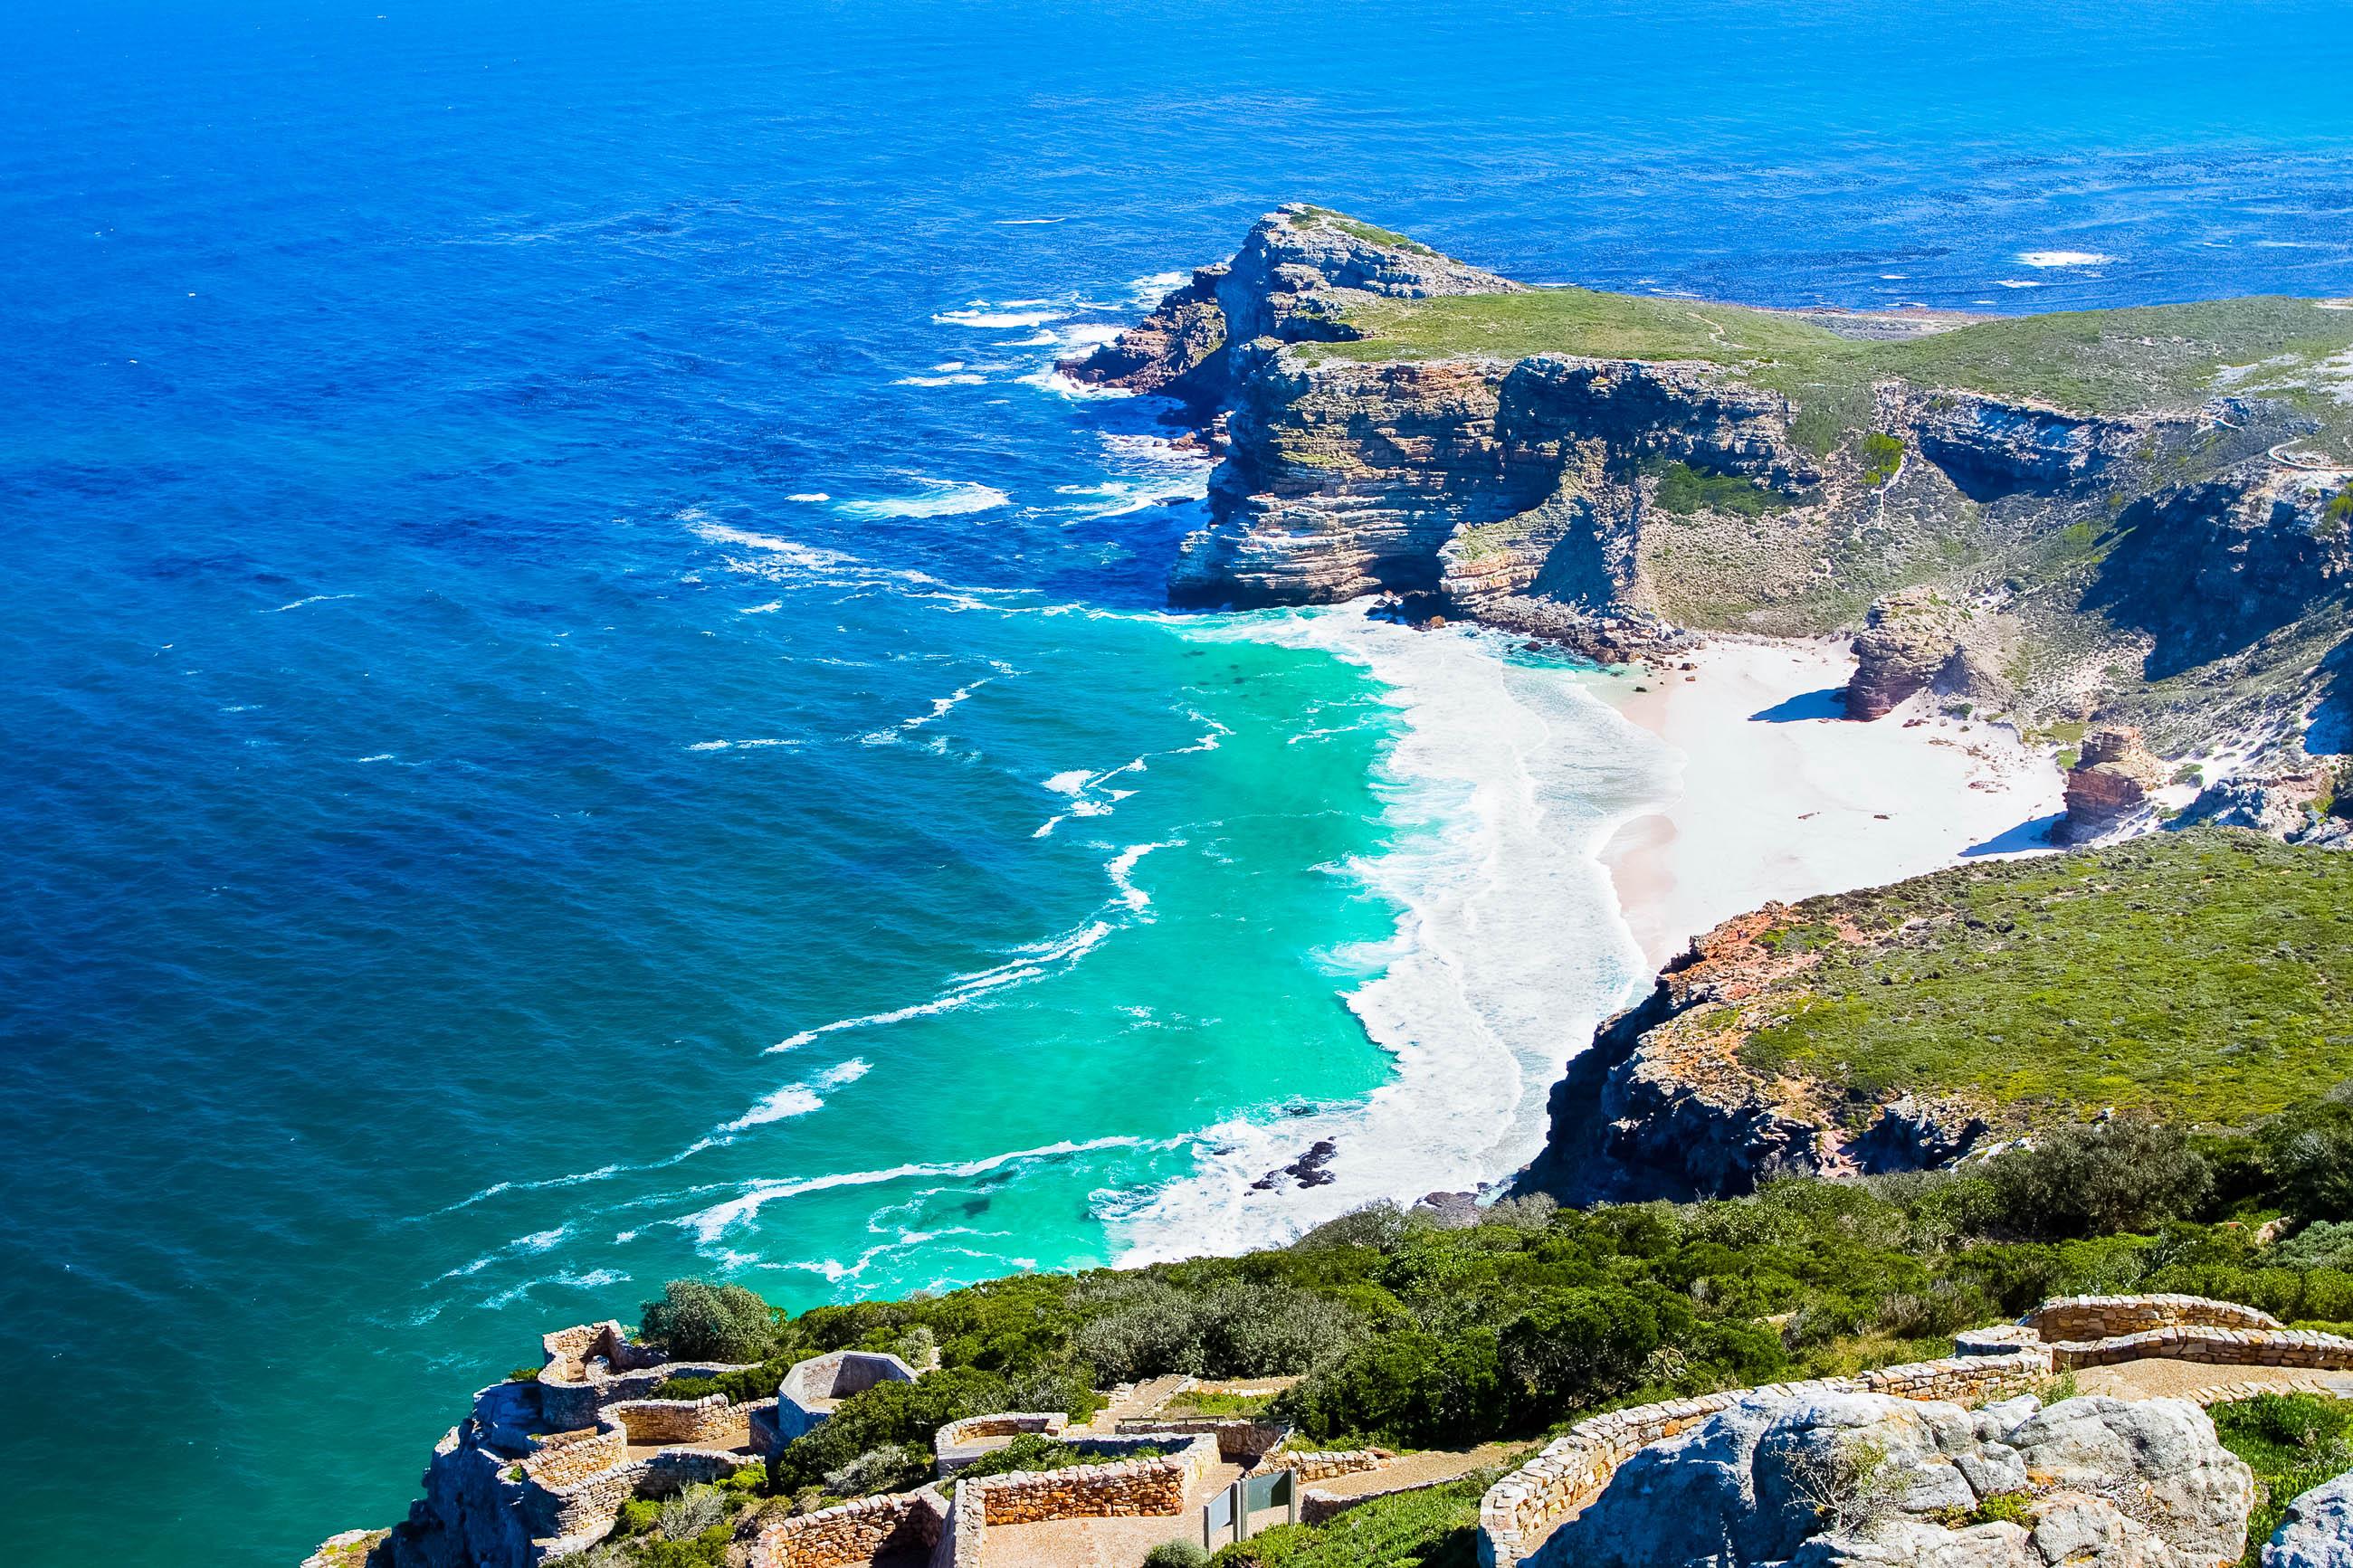 Naturreservat Kap Der Guten Hoffnung Sudafrika Franks Travelbox